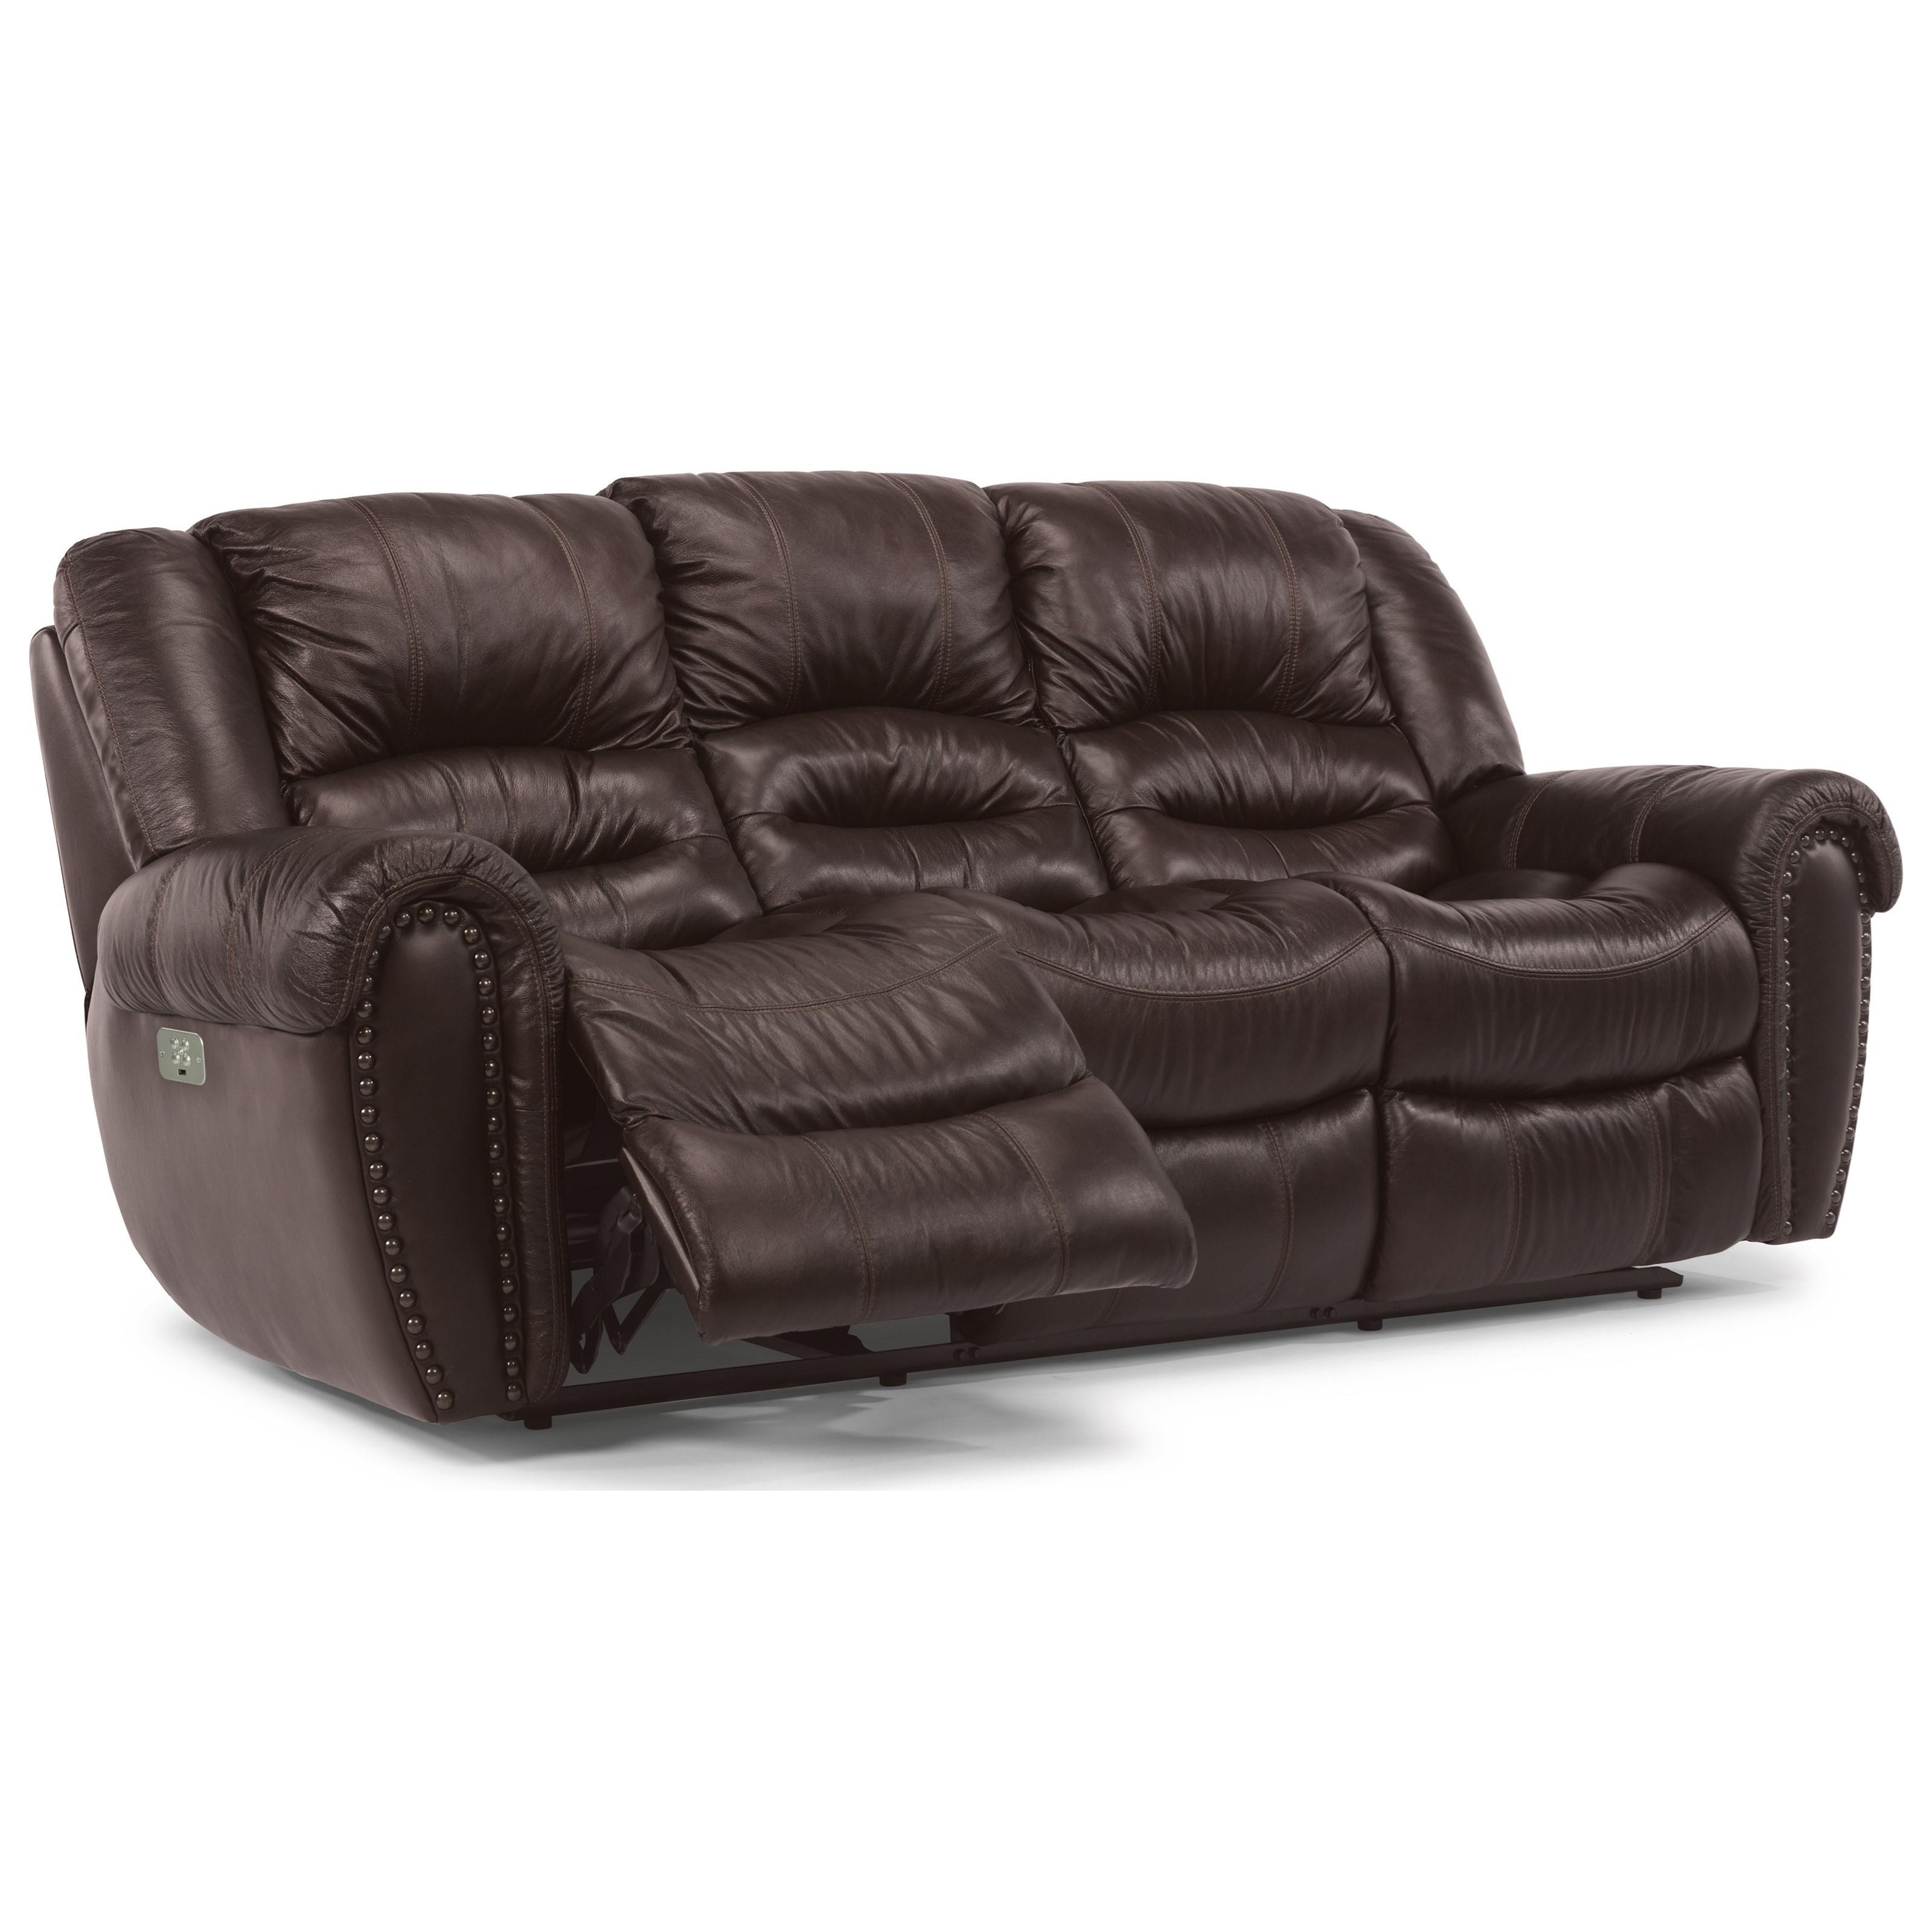 flexsteel crosstown 1210 62ph power reclining sofa with power rh dunkandbright com flexsteel reclining sofa assembly flexsteel reclining sofa reviews